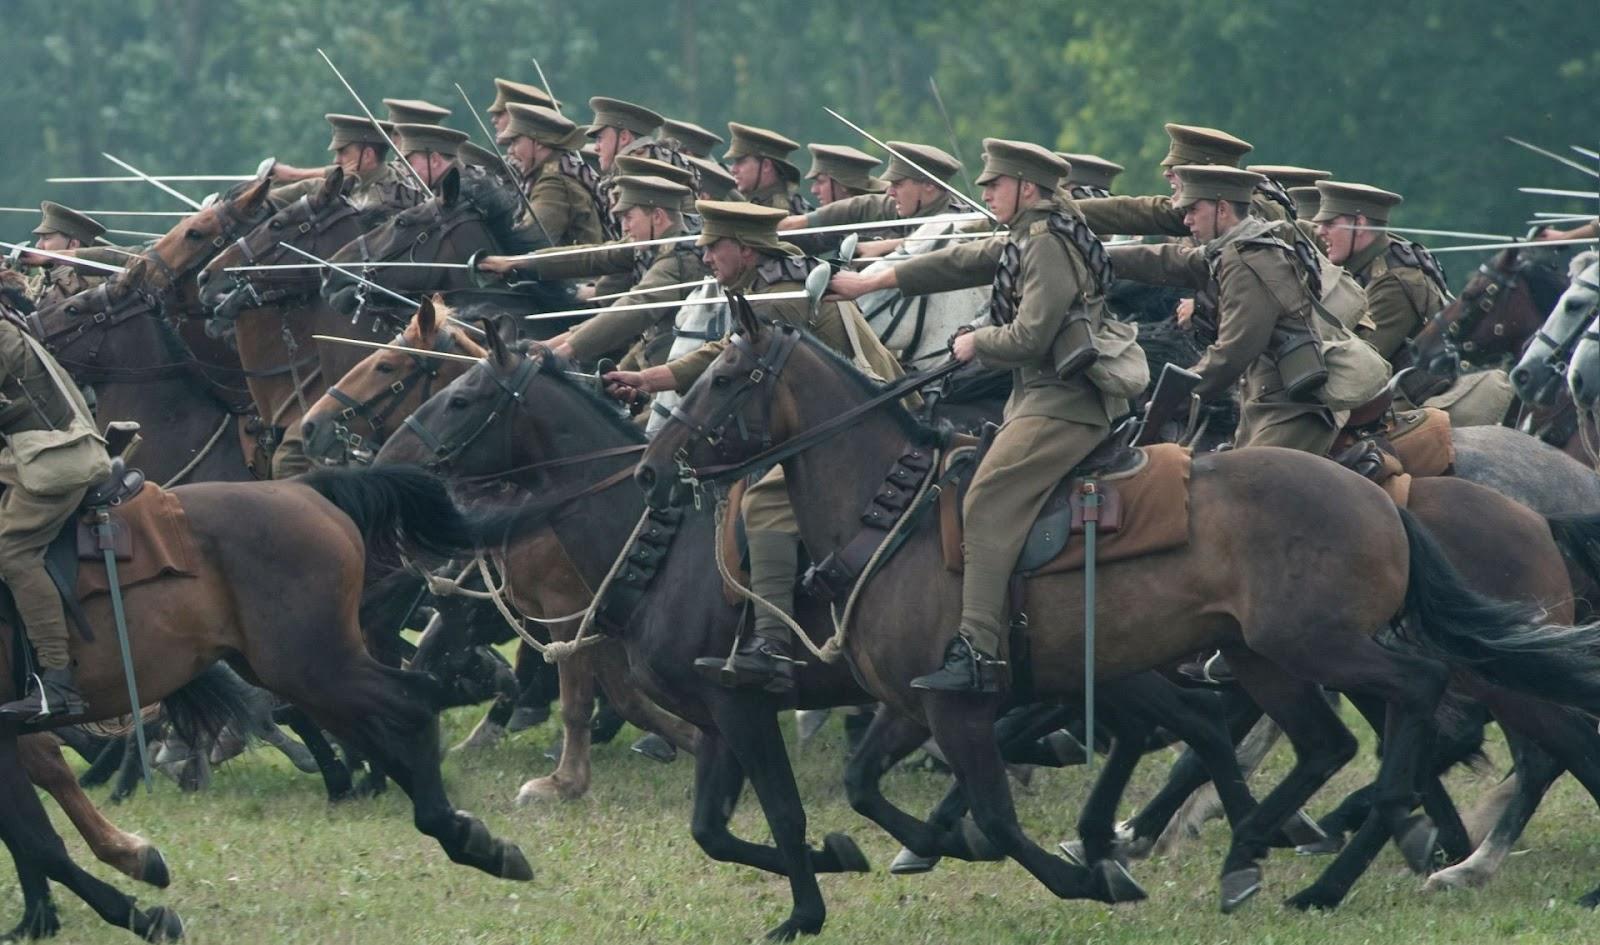 http://2.bp.blogspot.com/-ix49d-gnE88/UEsgWmLgRiI/AAAAAAAABCA/hXVo1sCzeWk/s1600/war-horse-movie-image-calvary-charge.jpg